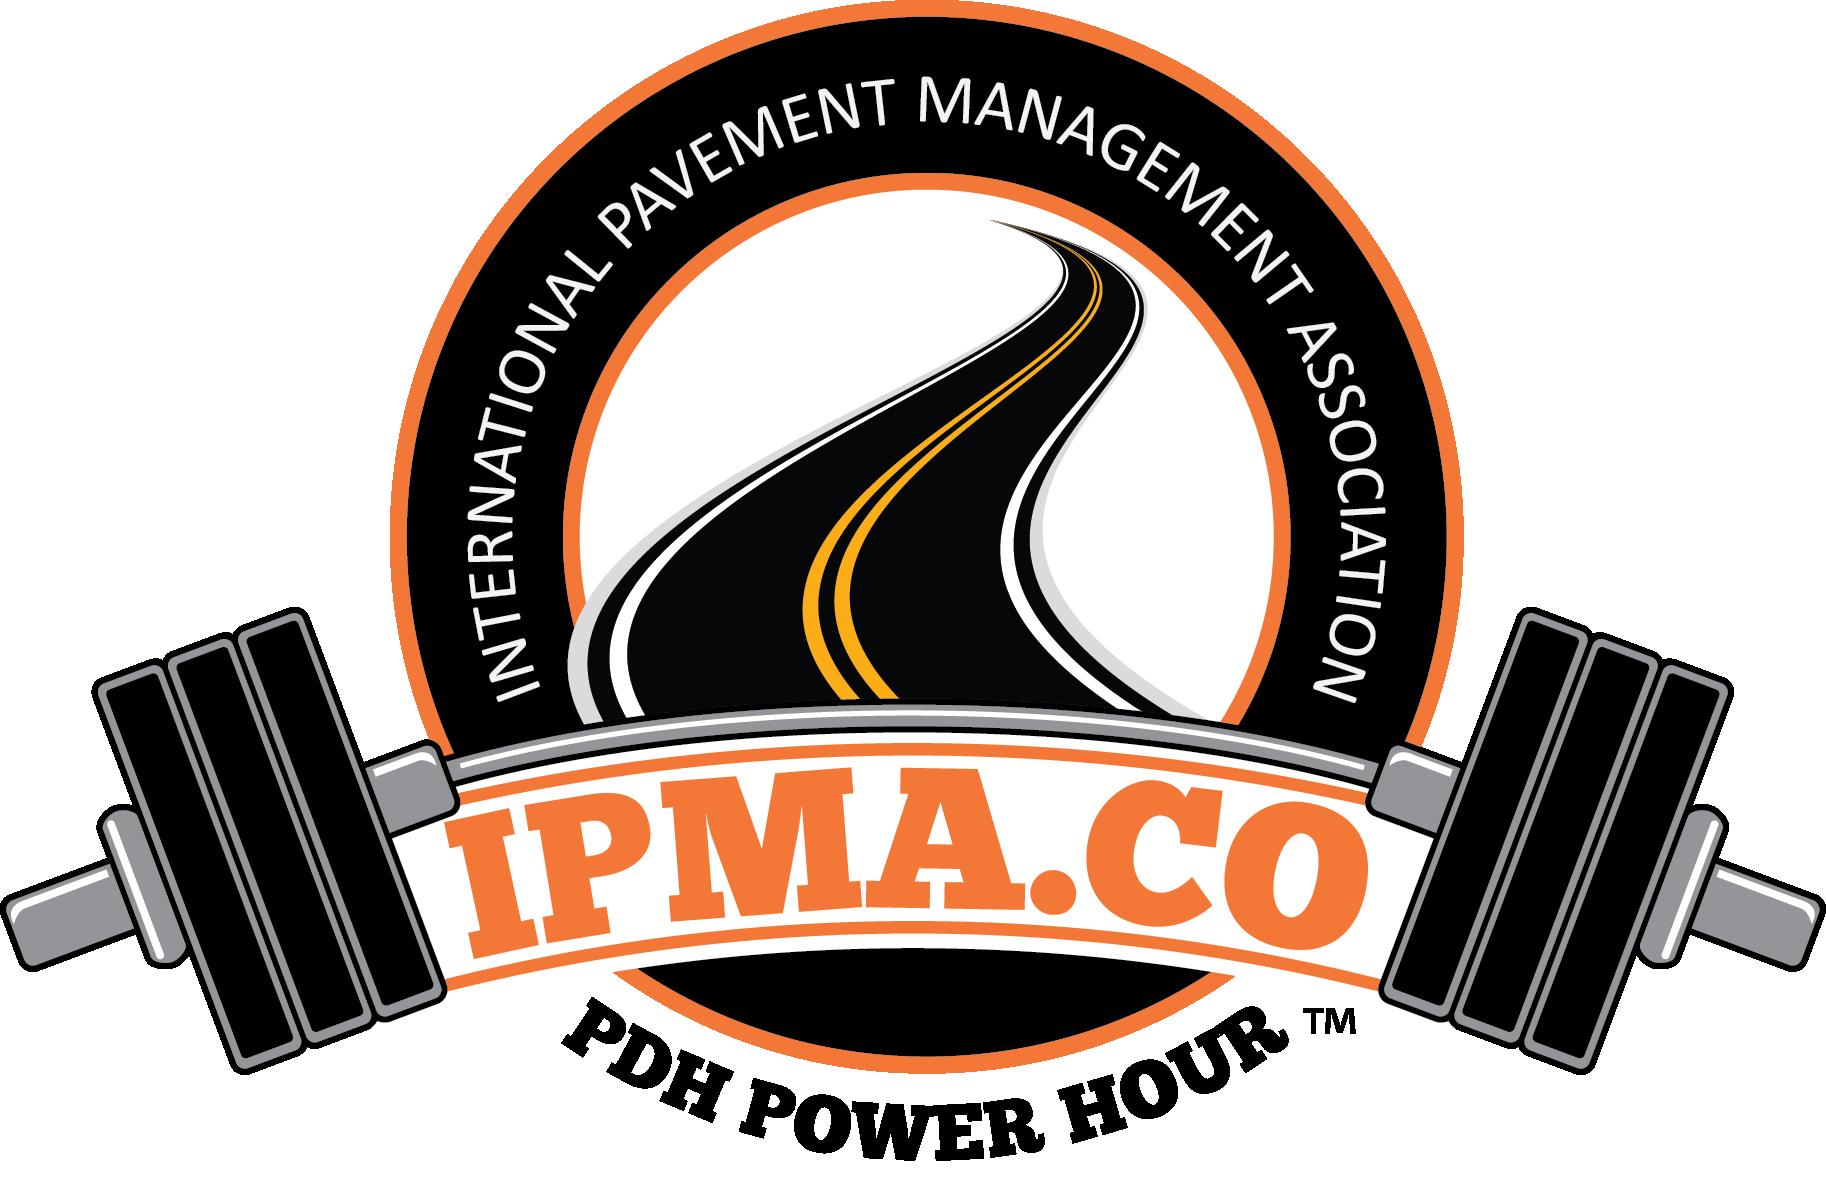 ipma-logo-powerhour.png